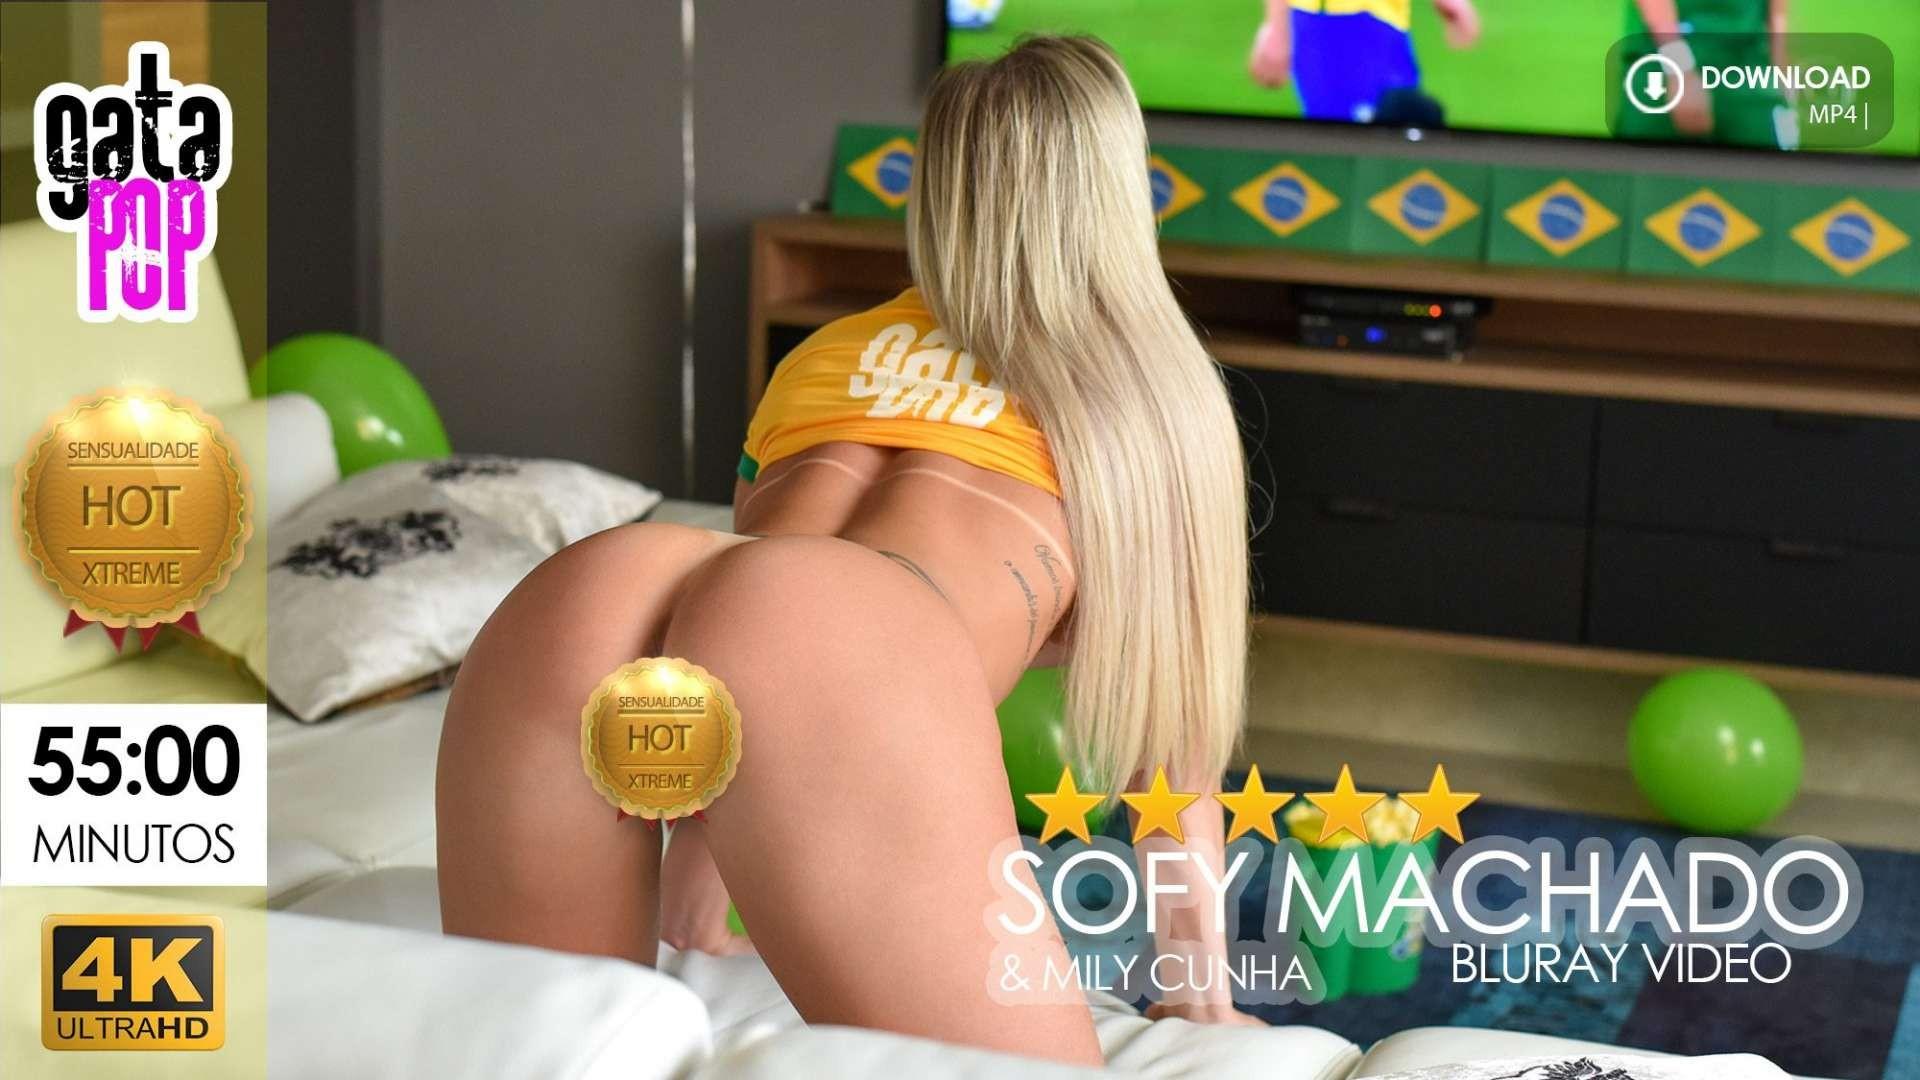 Sofy Machado - Copa - Bluray